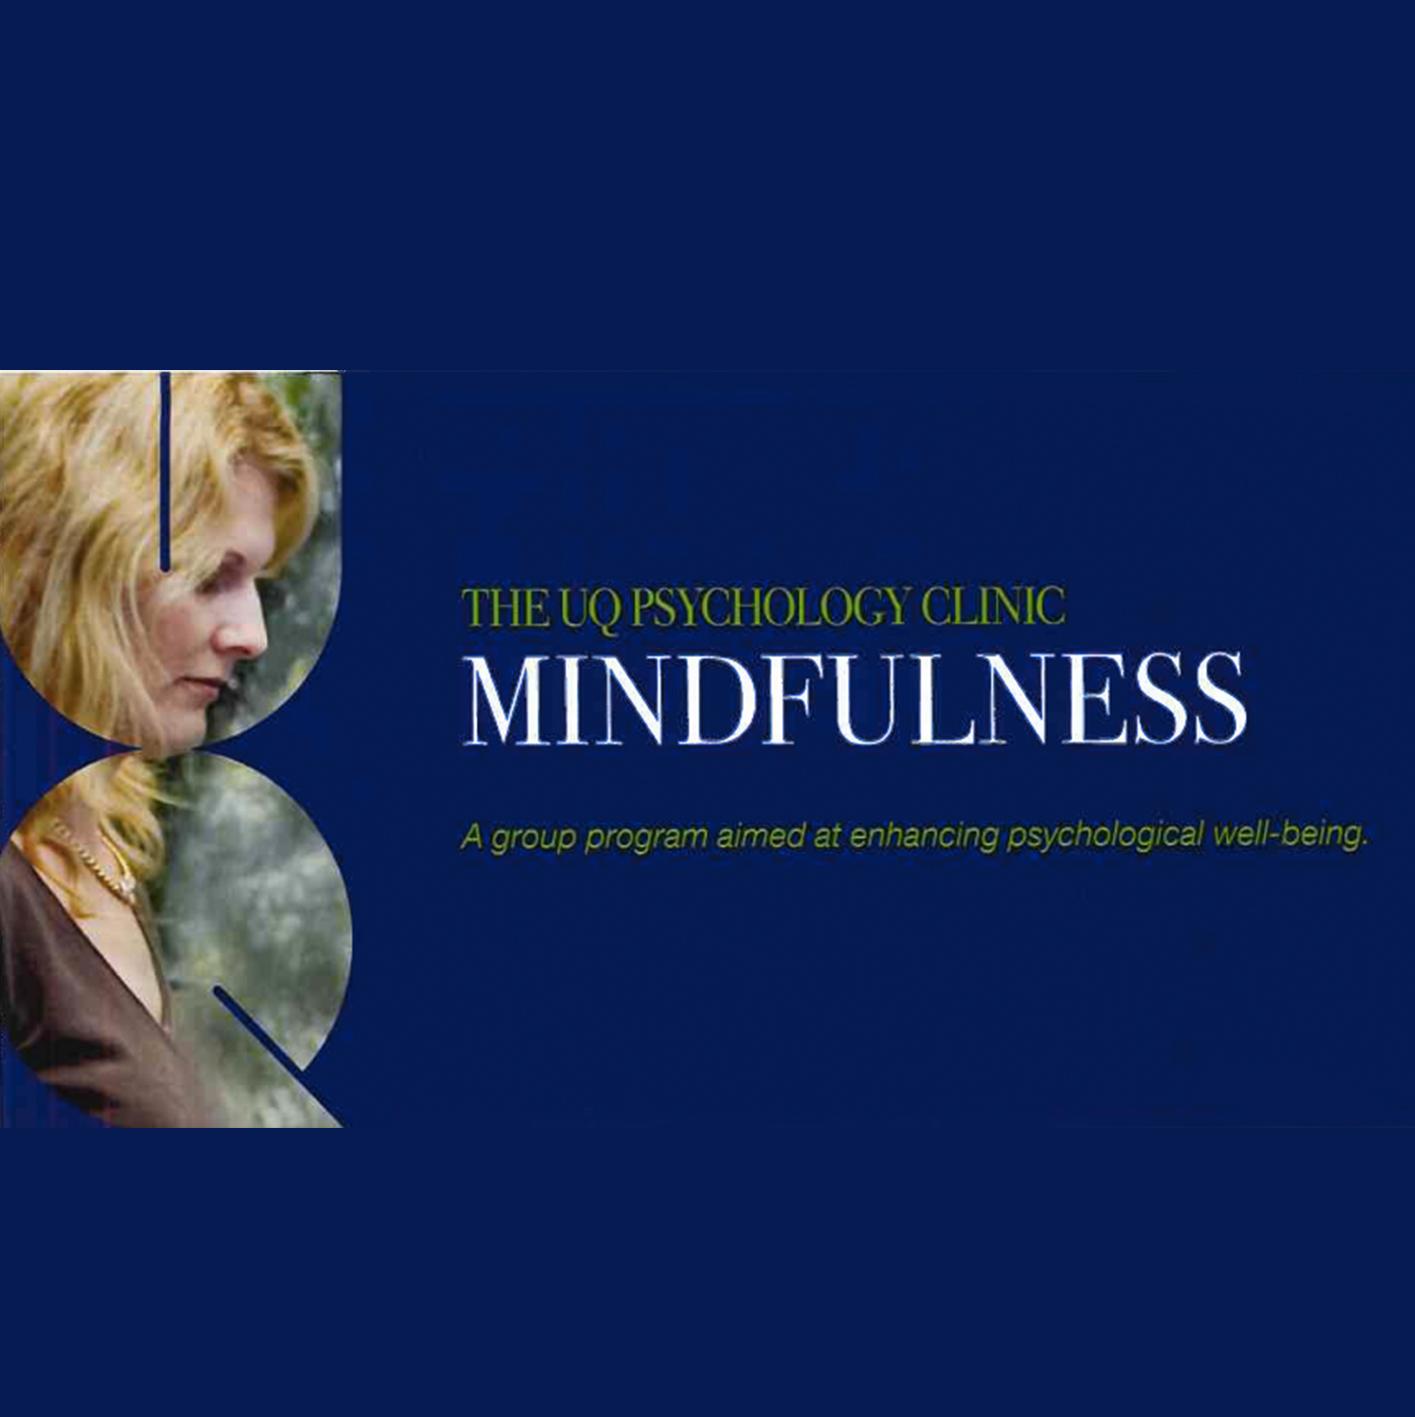 UQ mindfulness.jpg